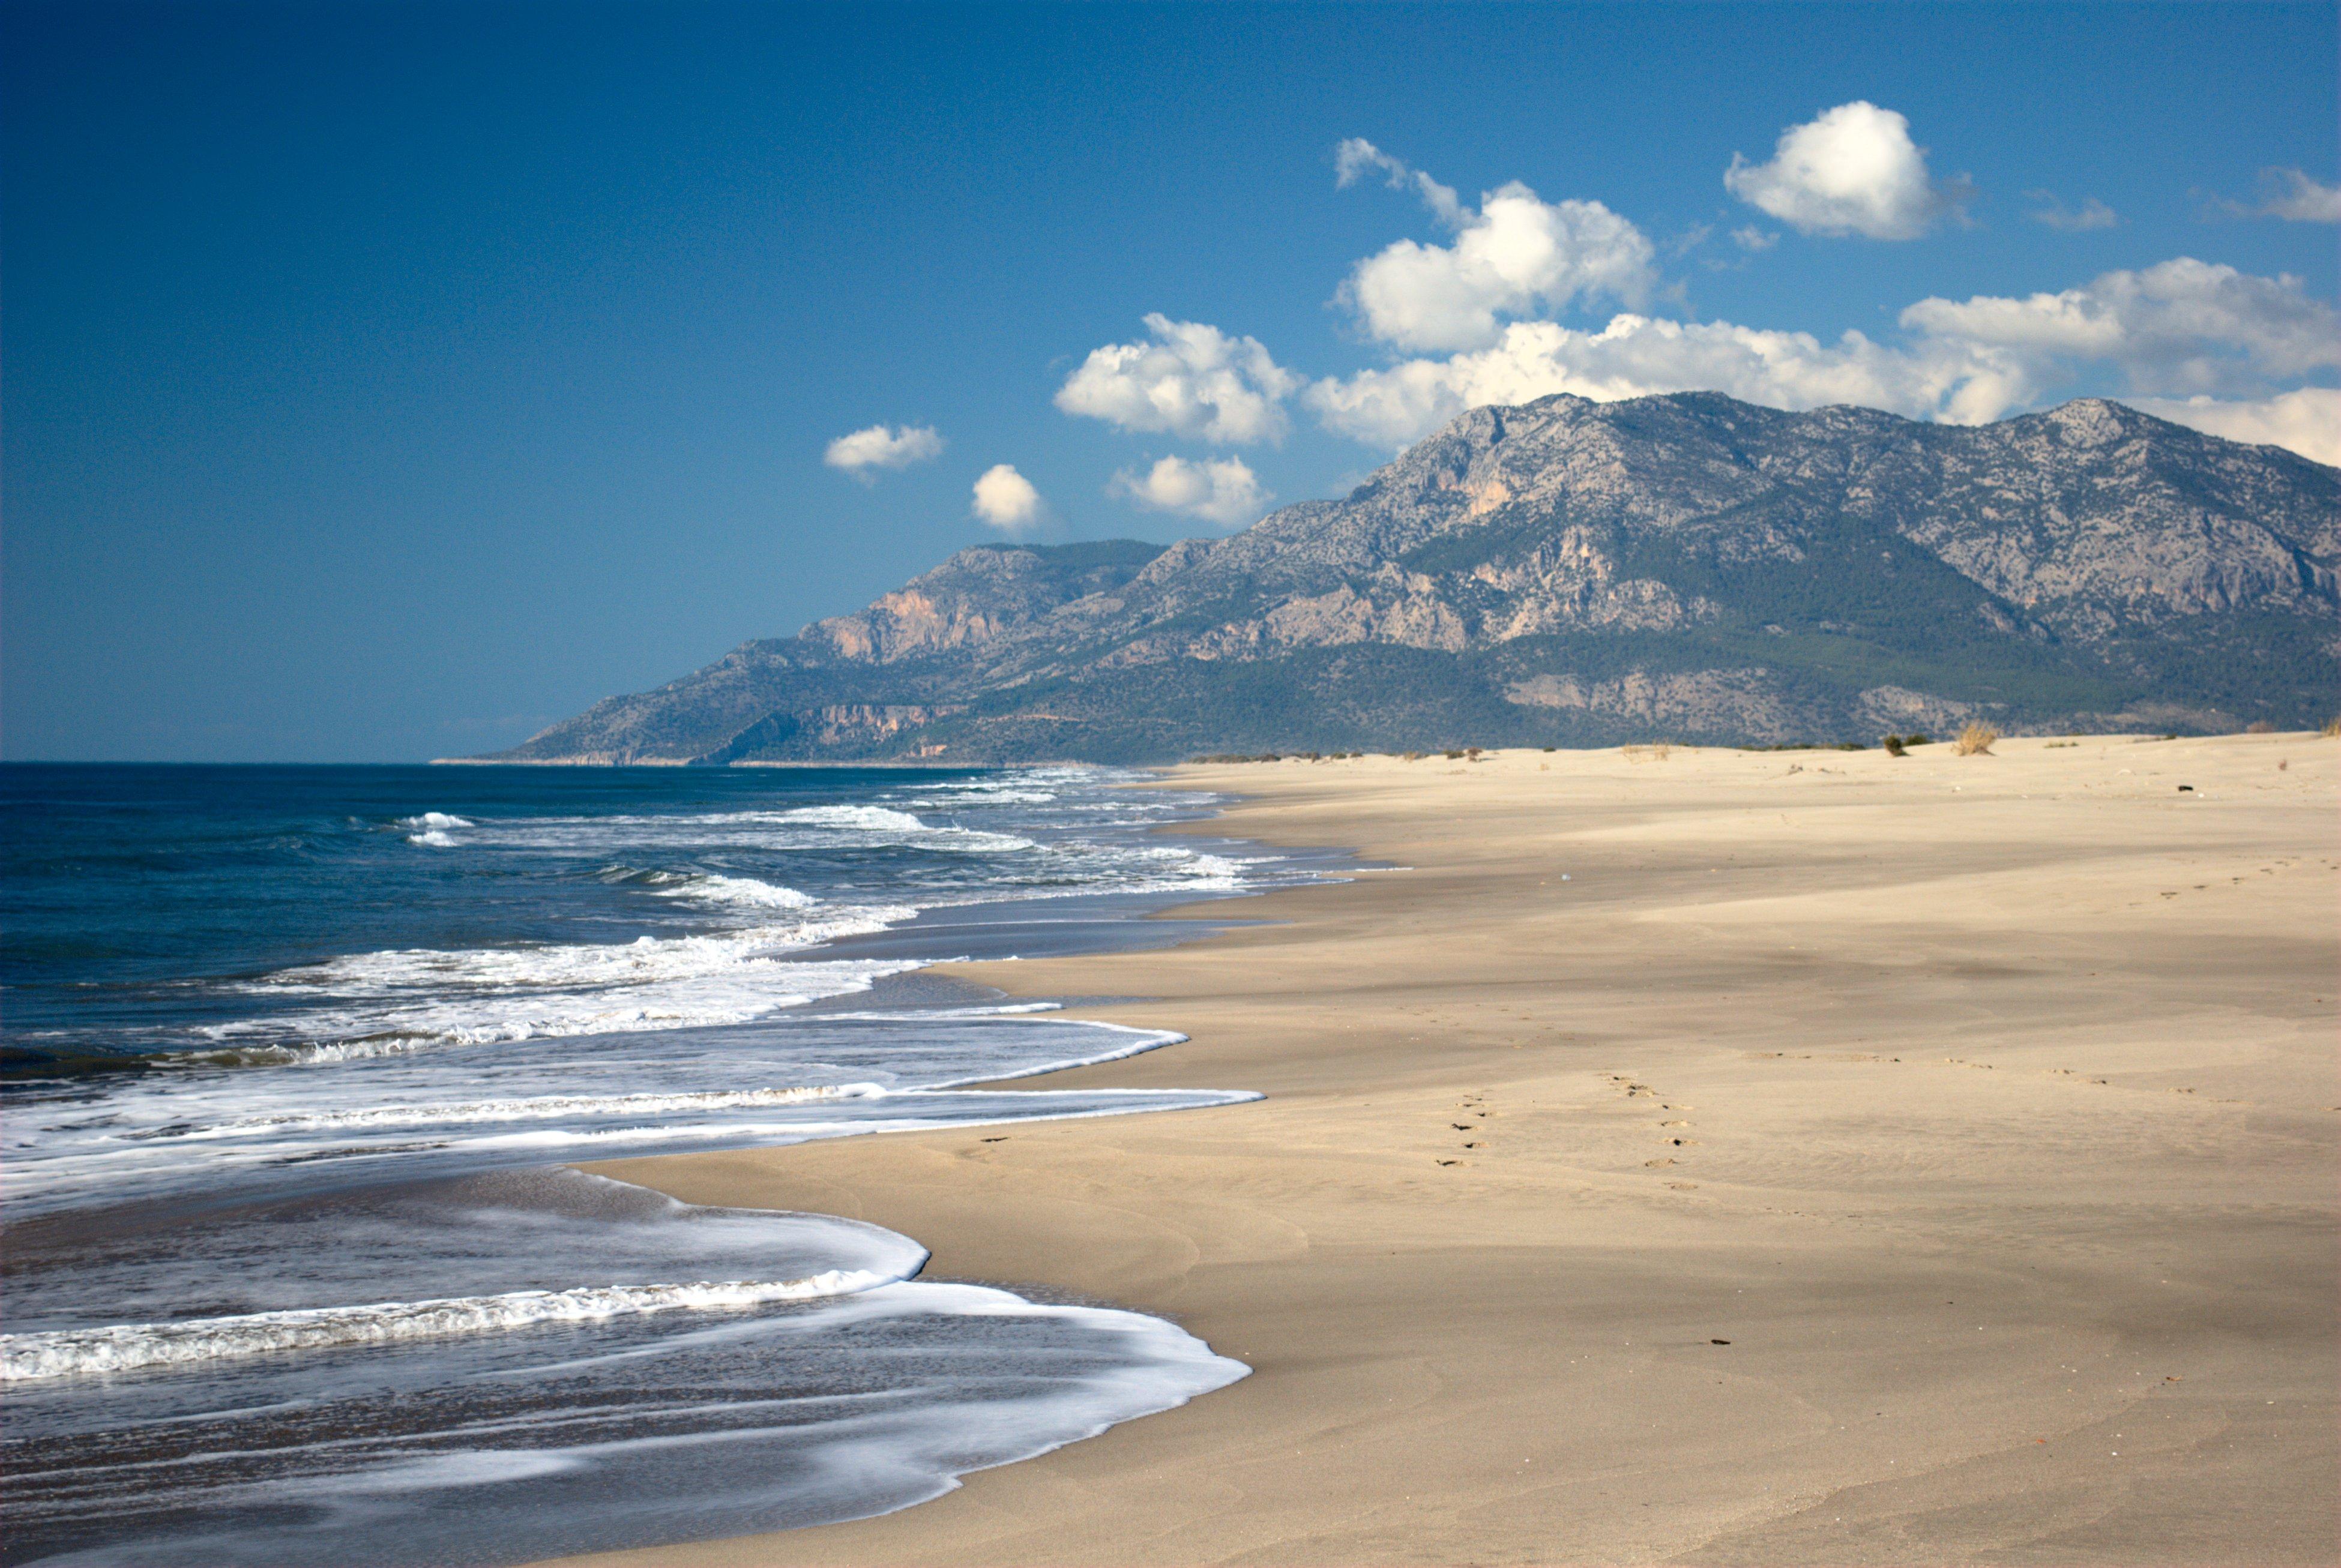 a seashore and mountains